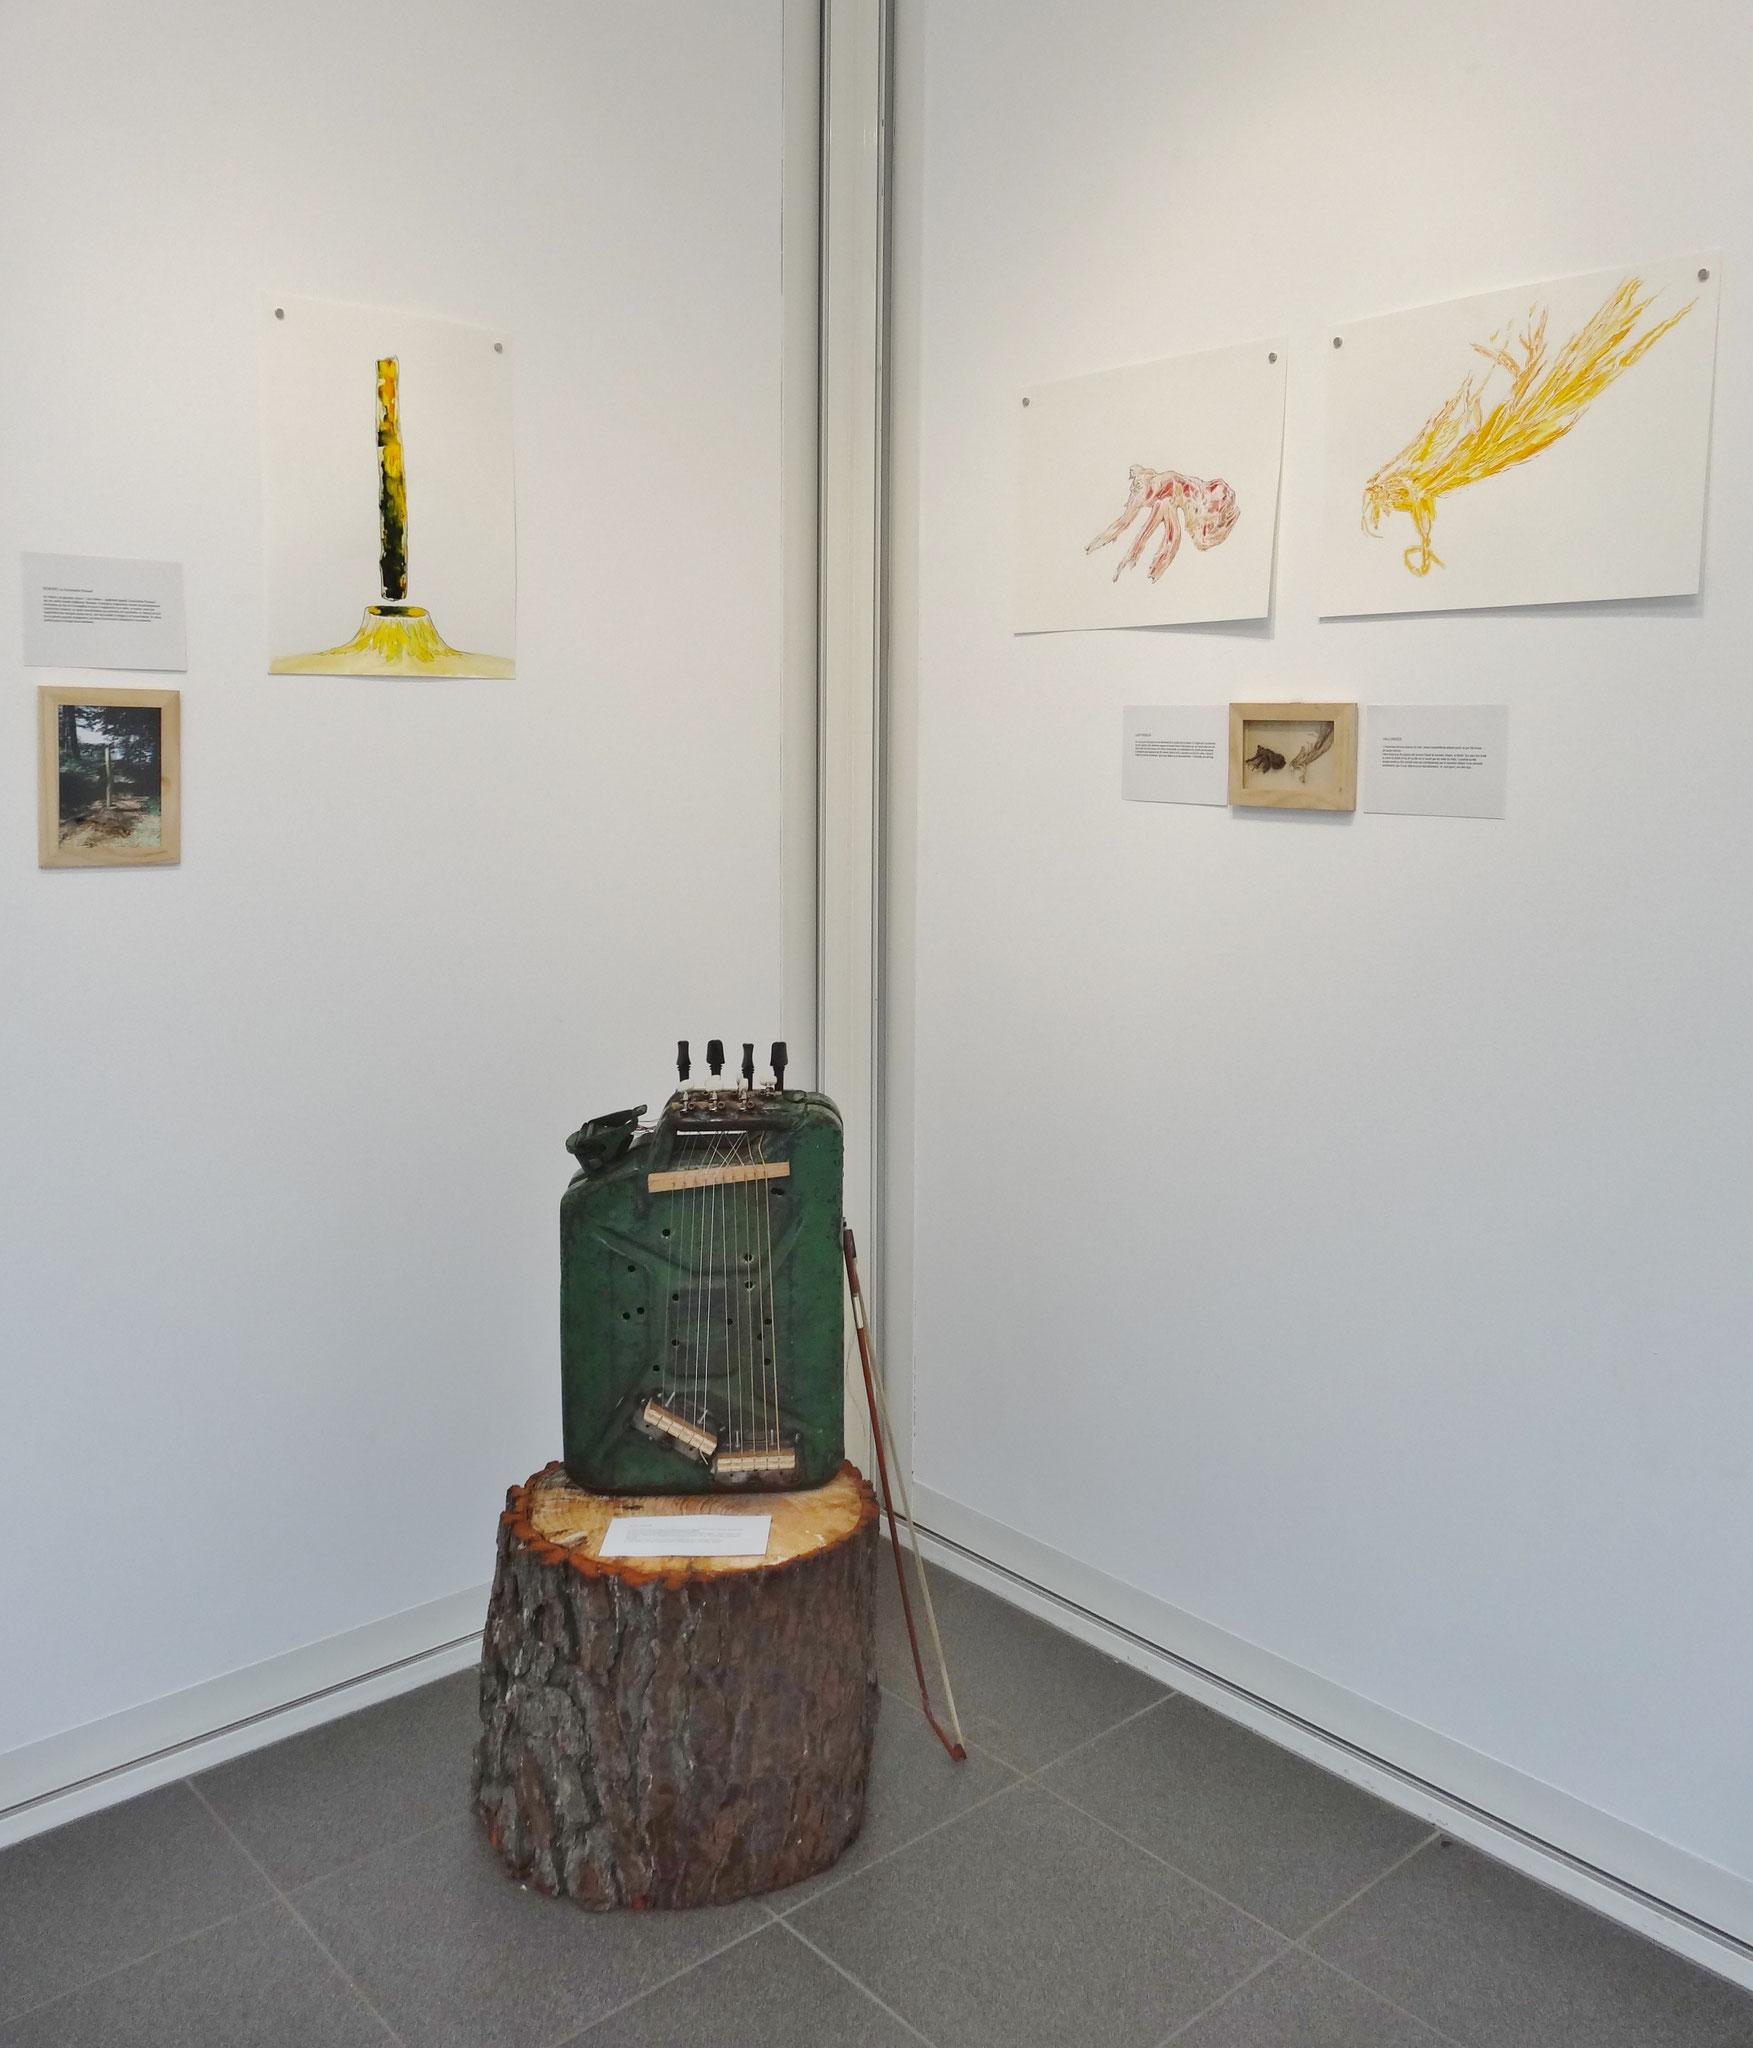 Vue de l'exposition Karine Bernadou & Noël Rasendrason, D'esprits et de cris